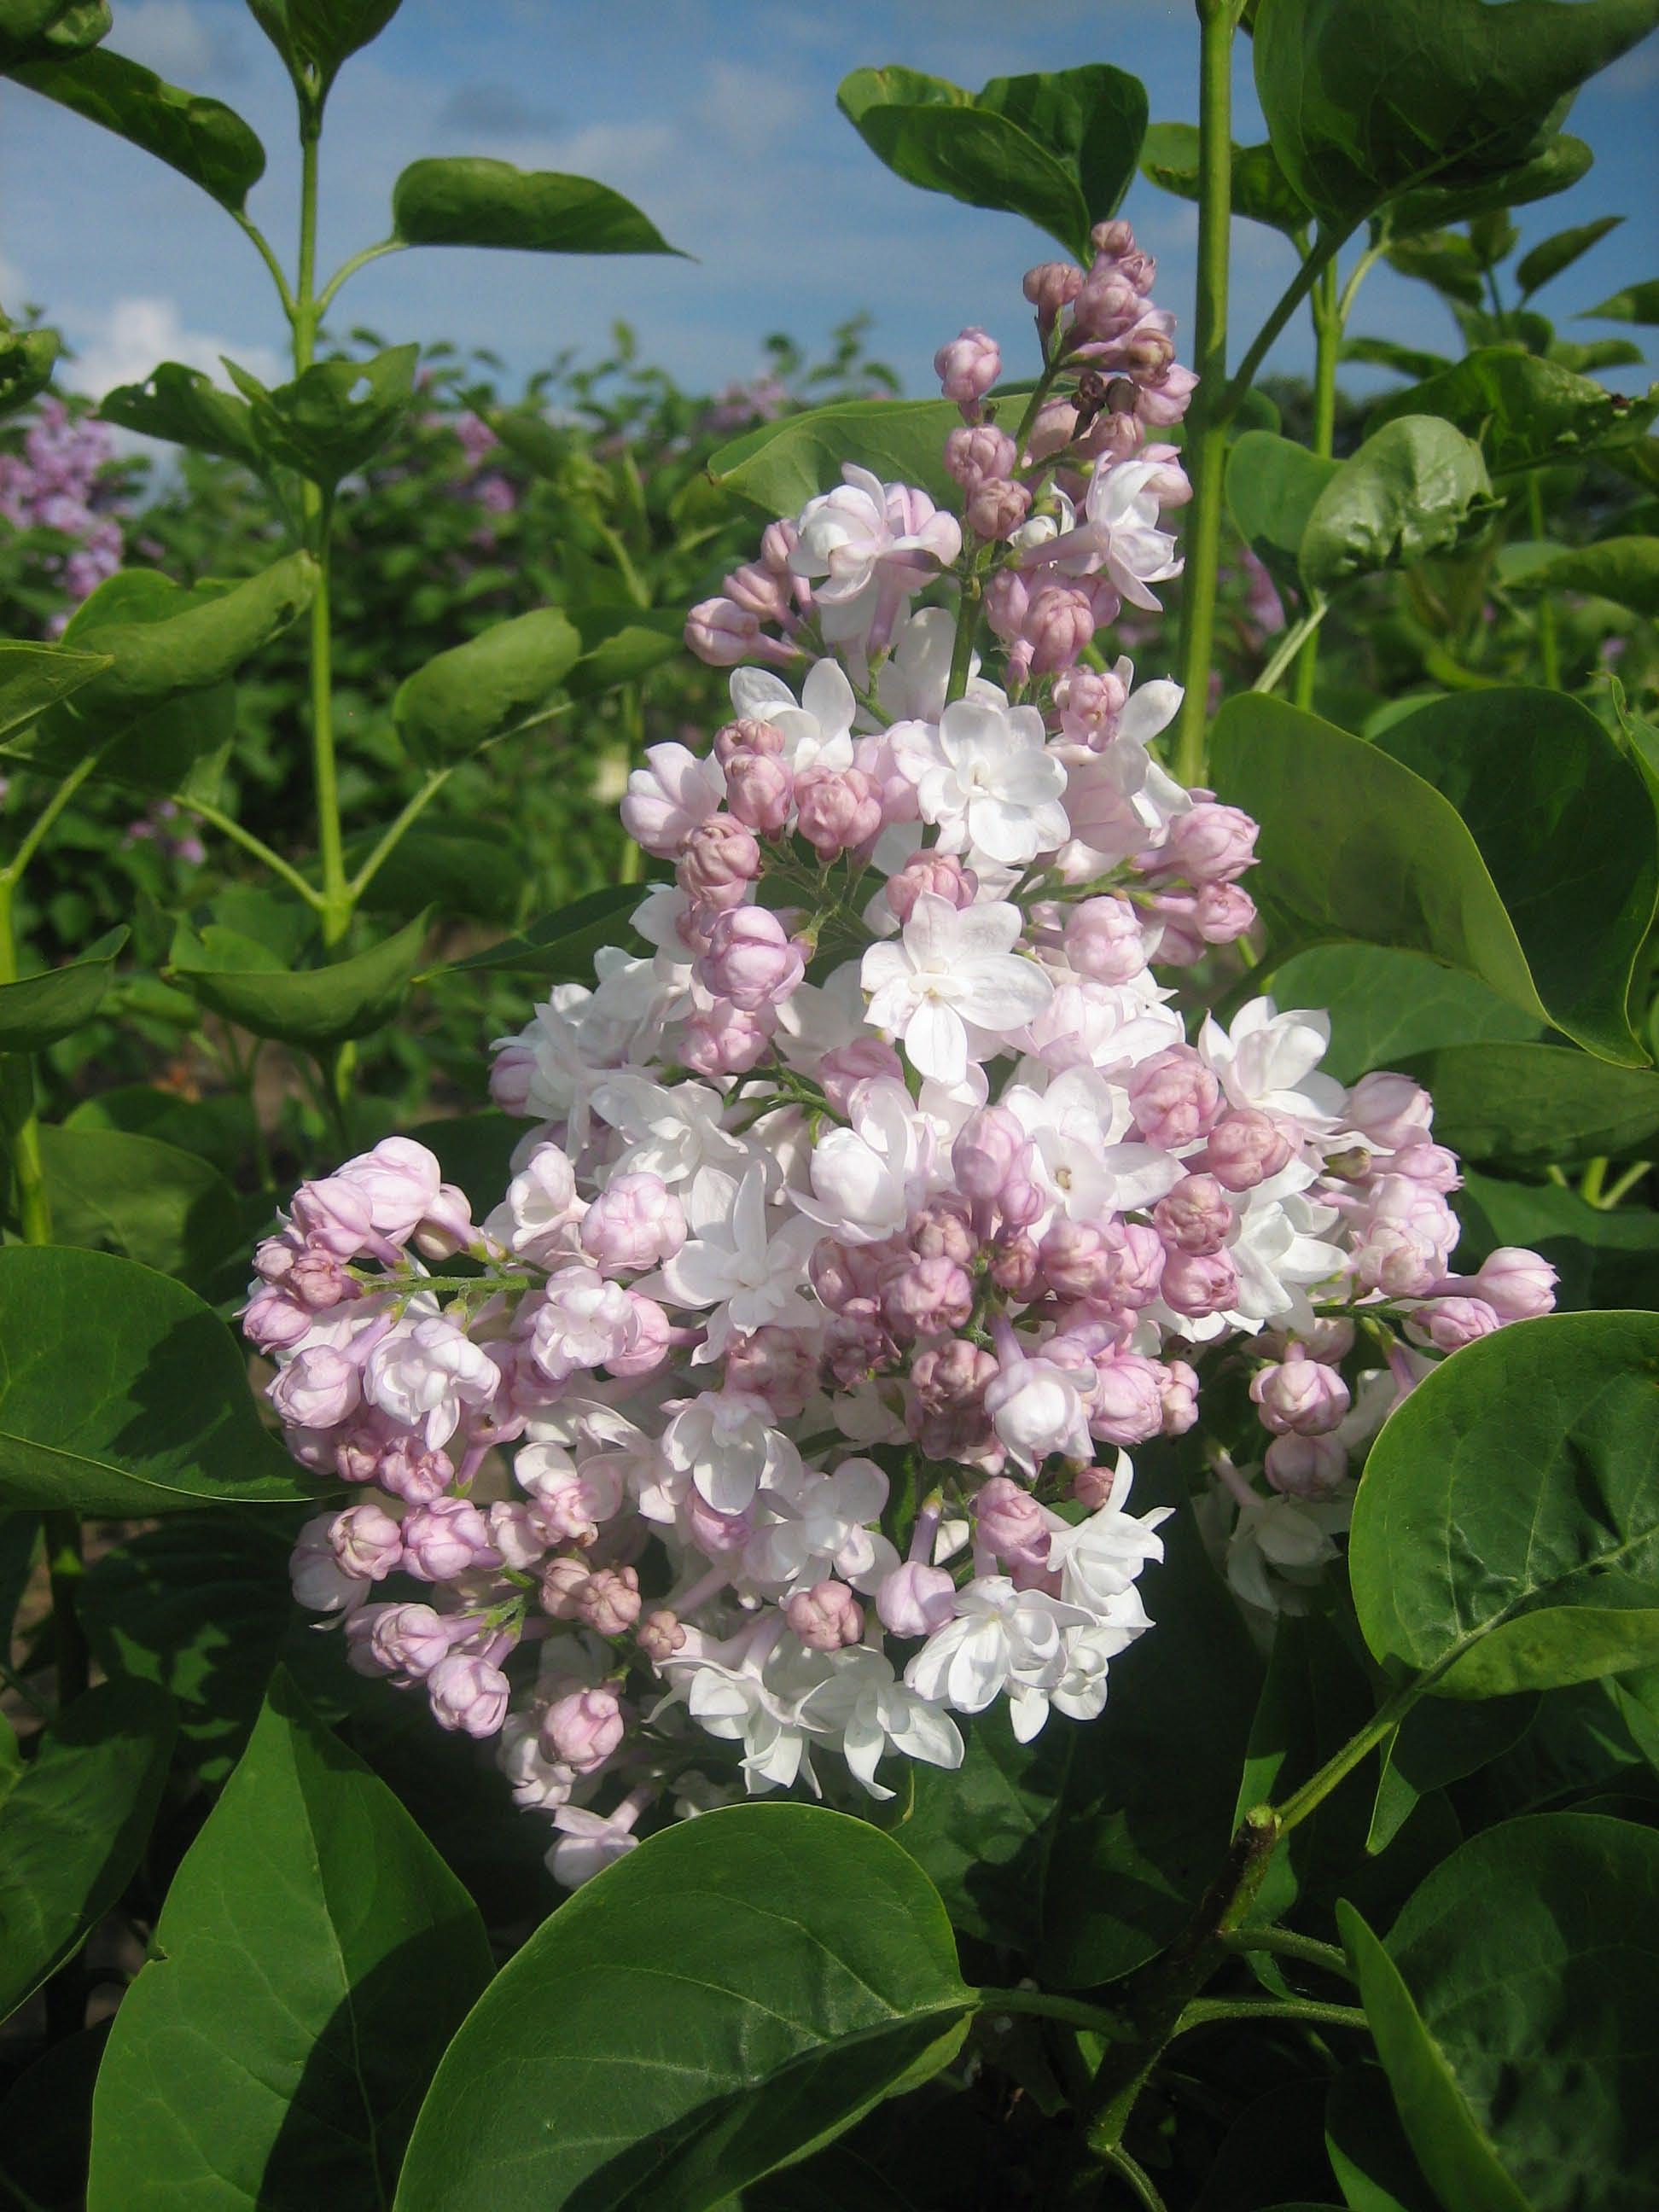 Syringa vulgaris 'Beauty of Moscow' (alm. syren)